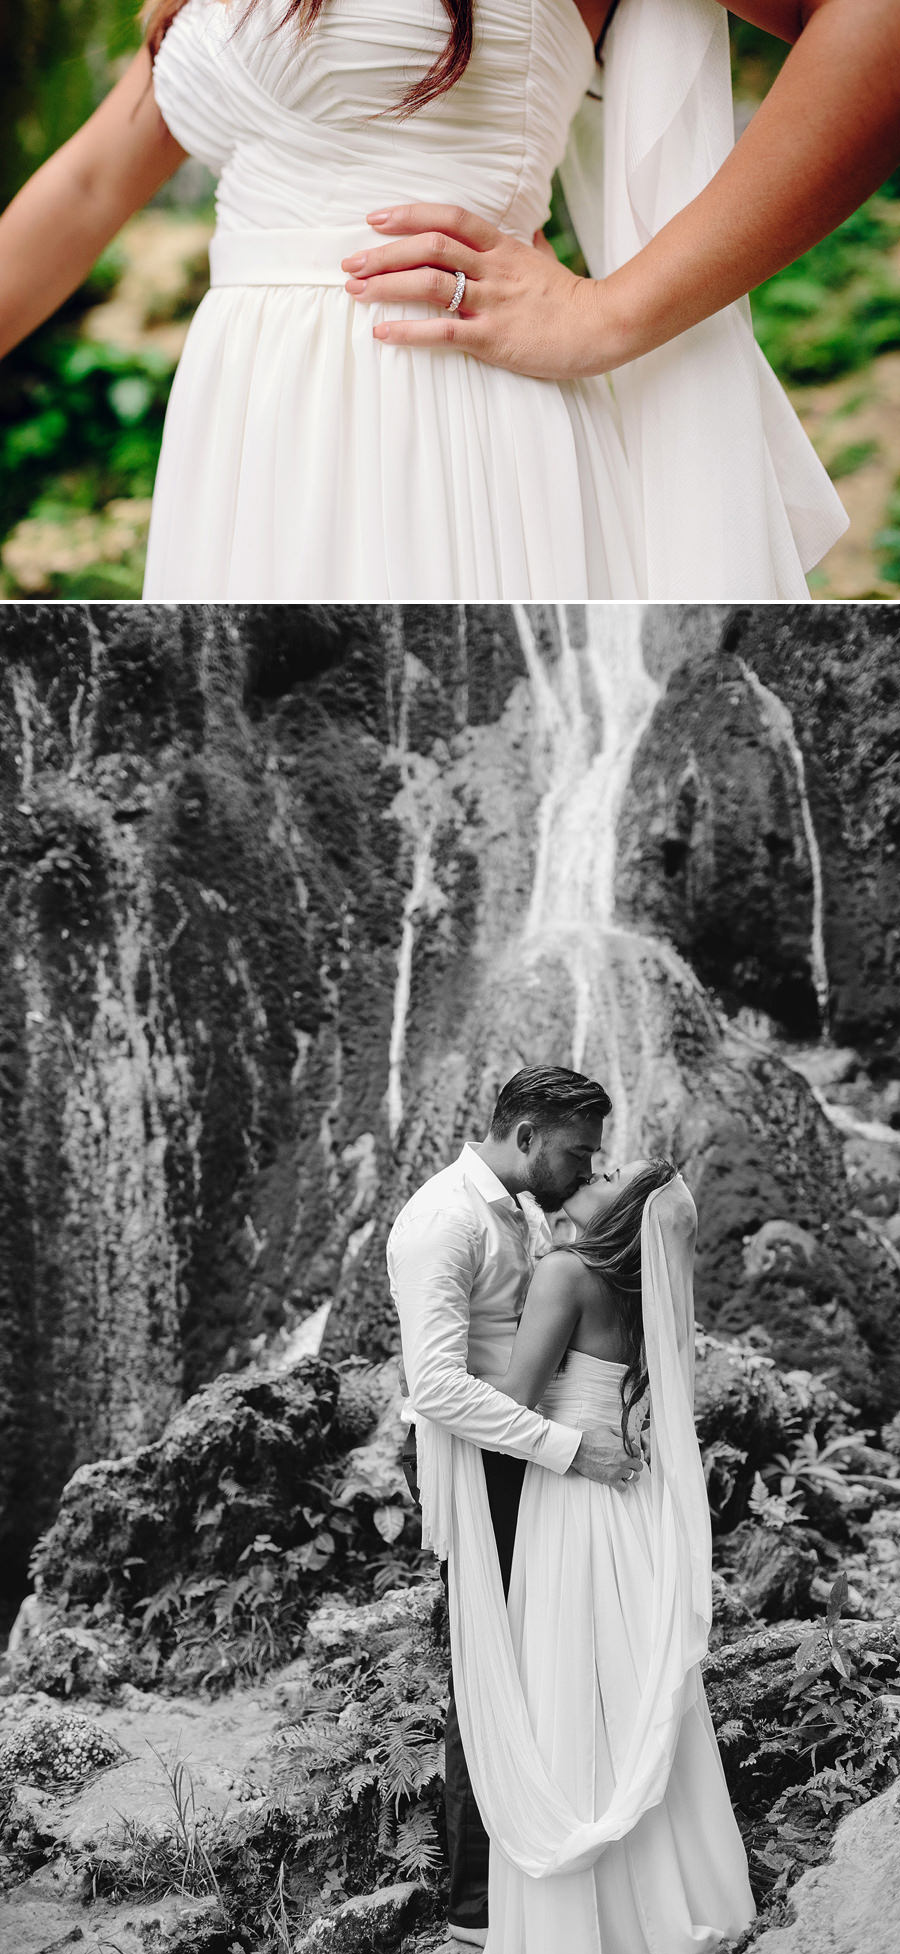 Mele Cascades Vanuatu Wedding Photography: Karla & Corey